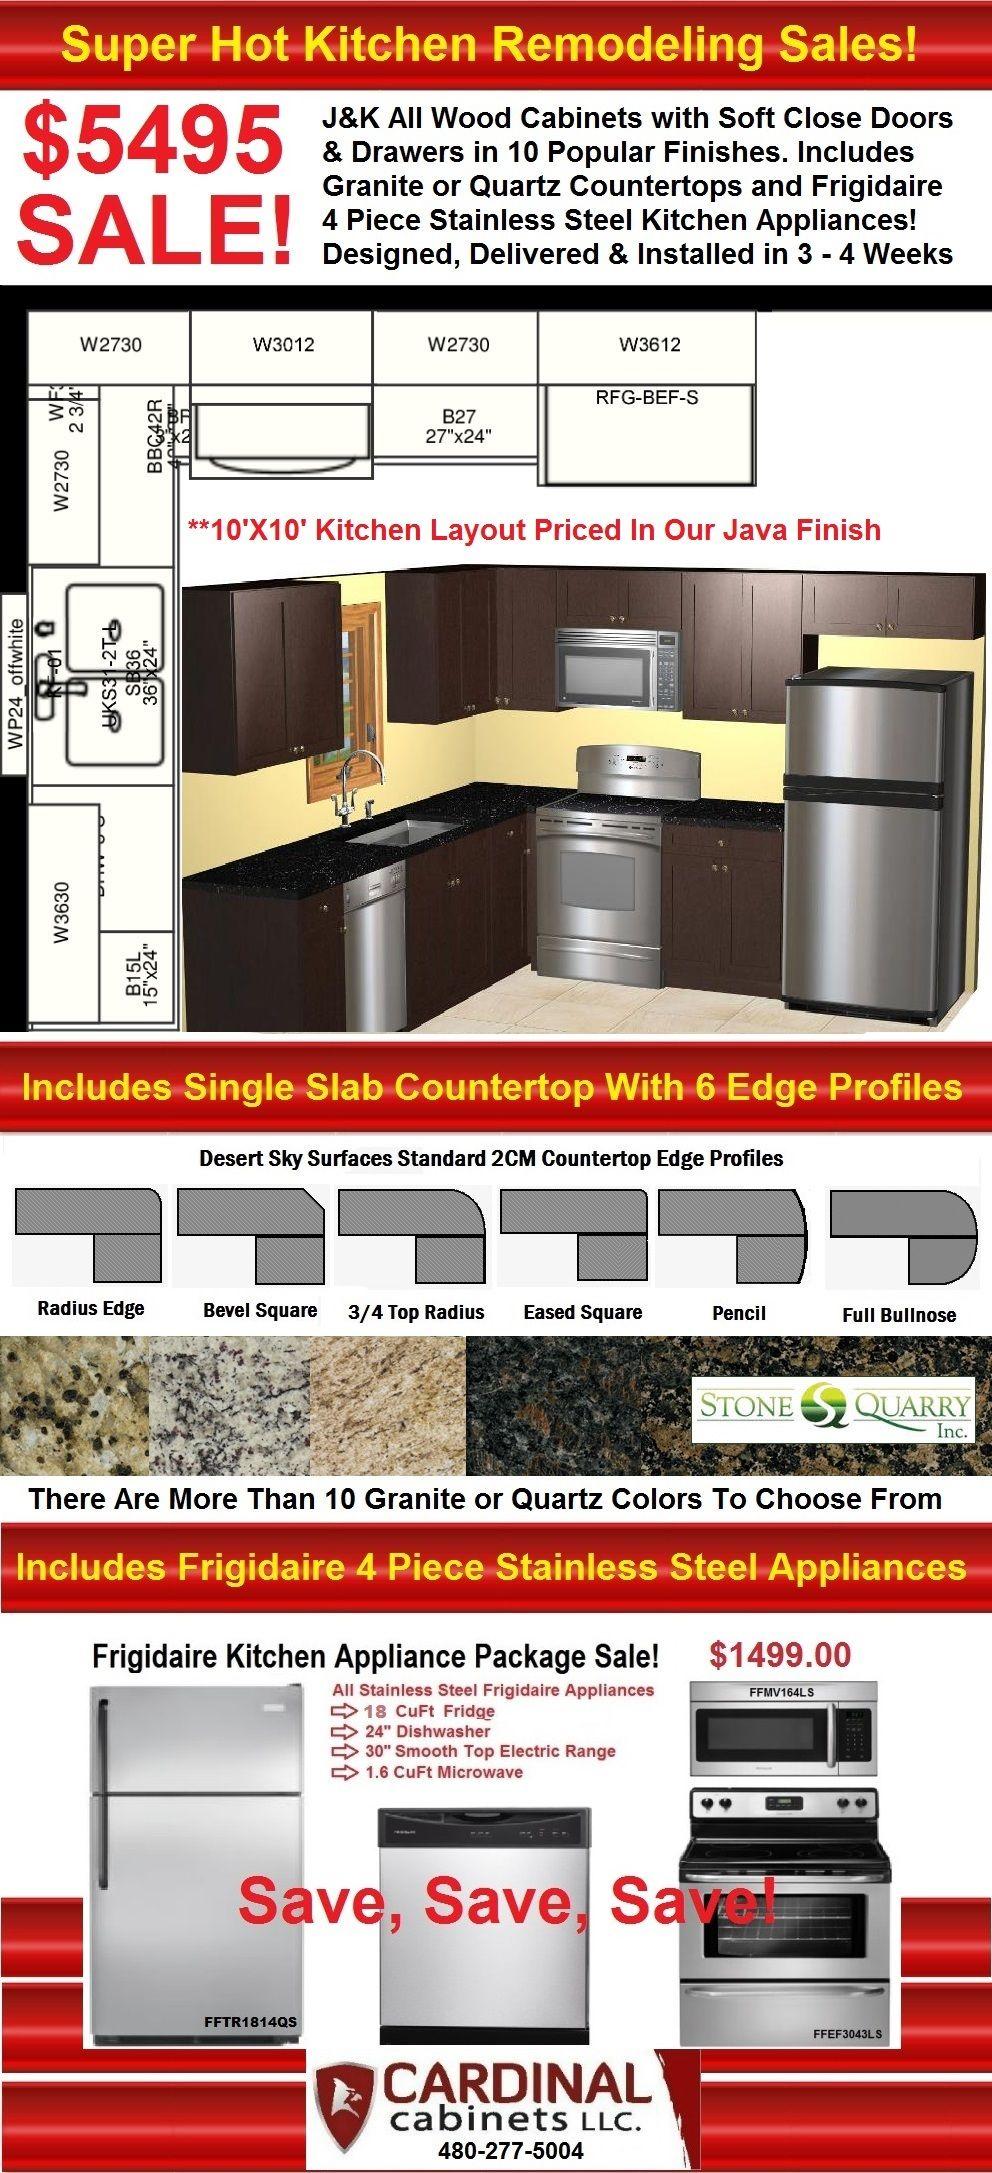 5495 java kitchen cabinets countertops appliances sale mesa